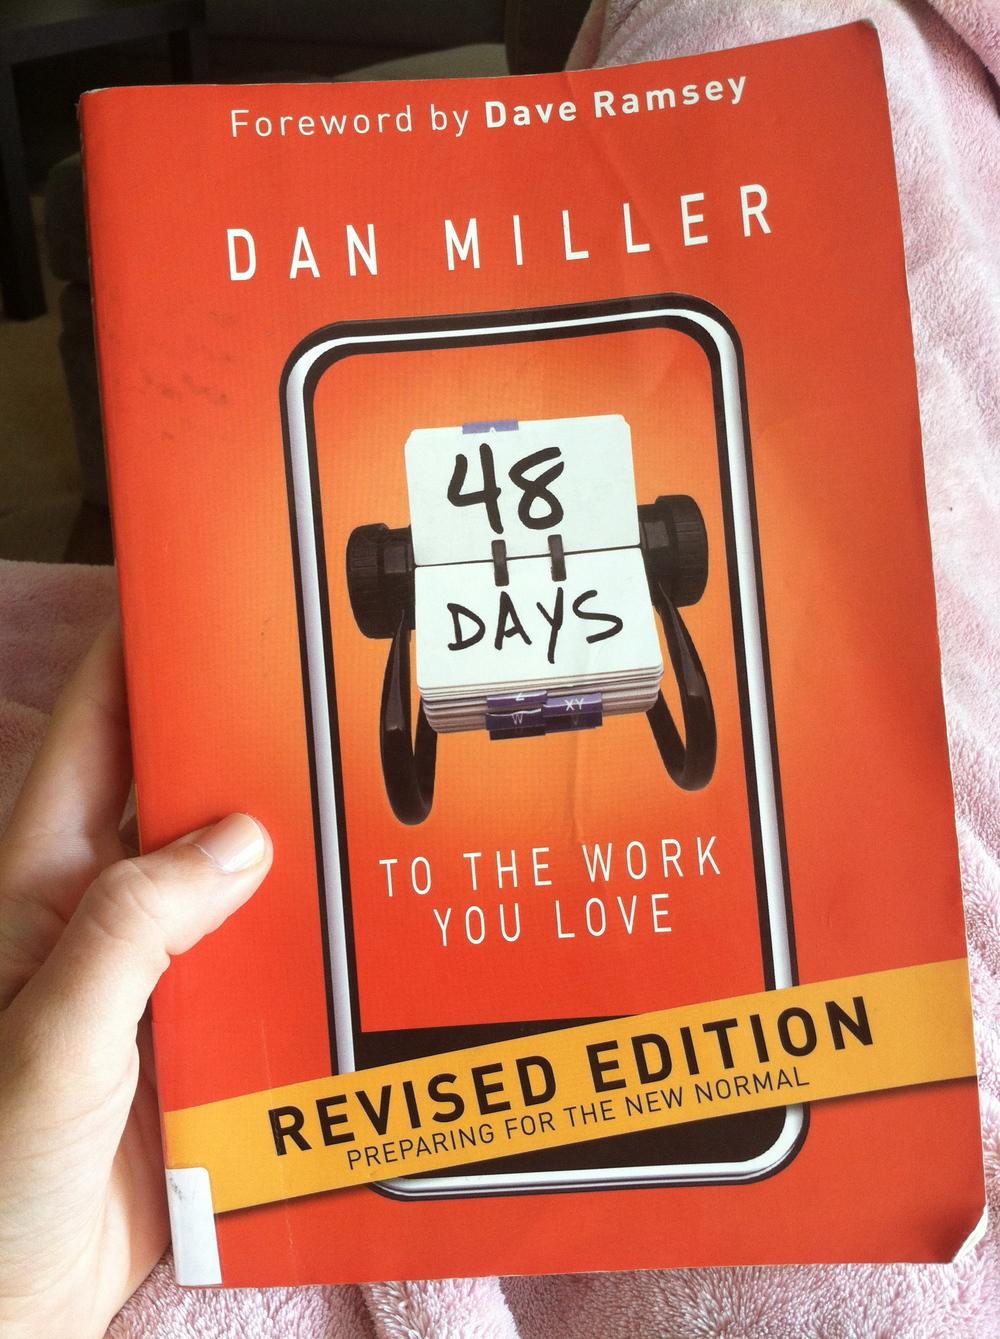 48 days book